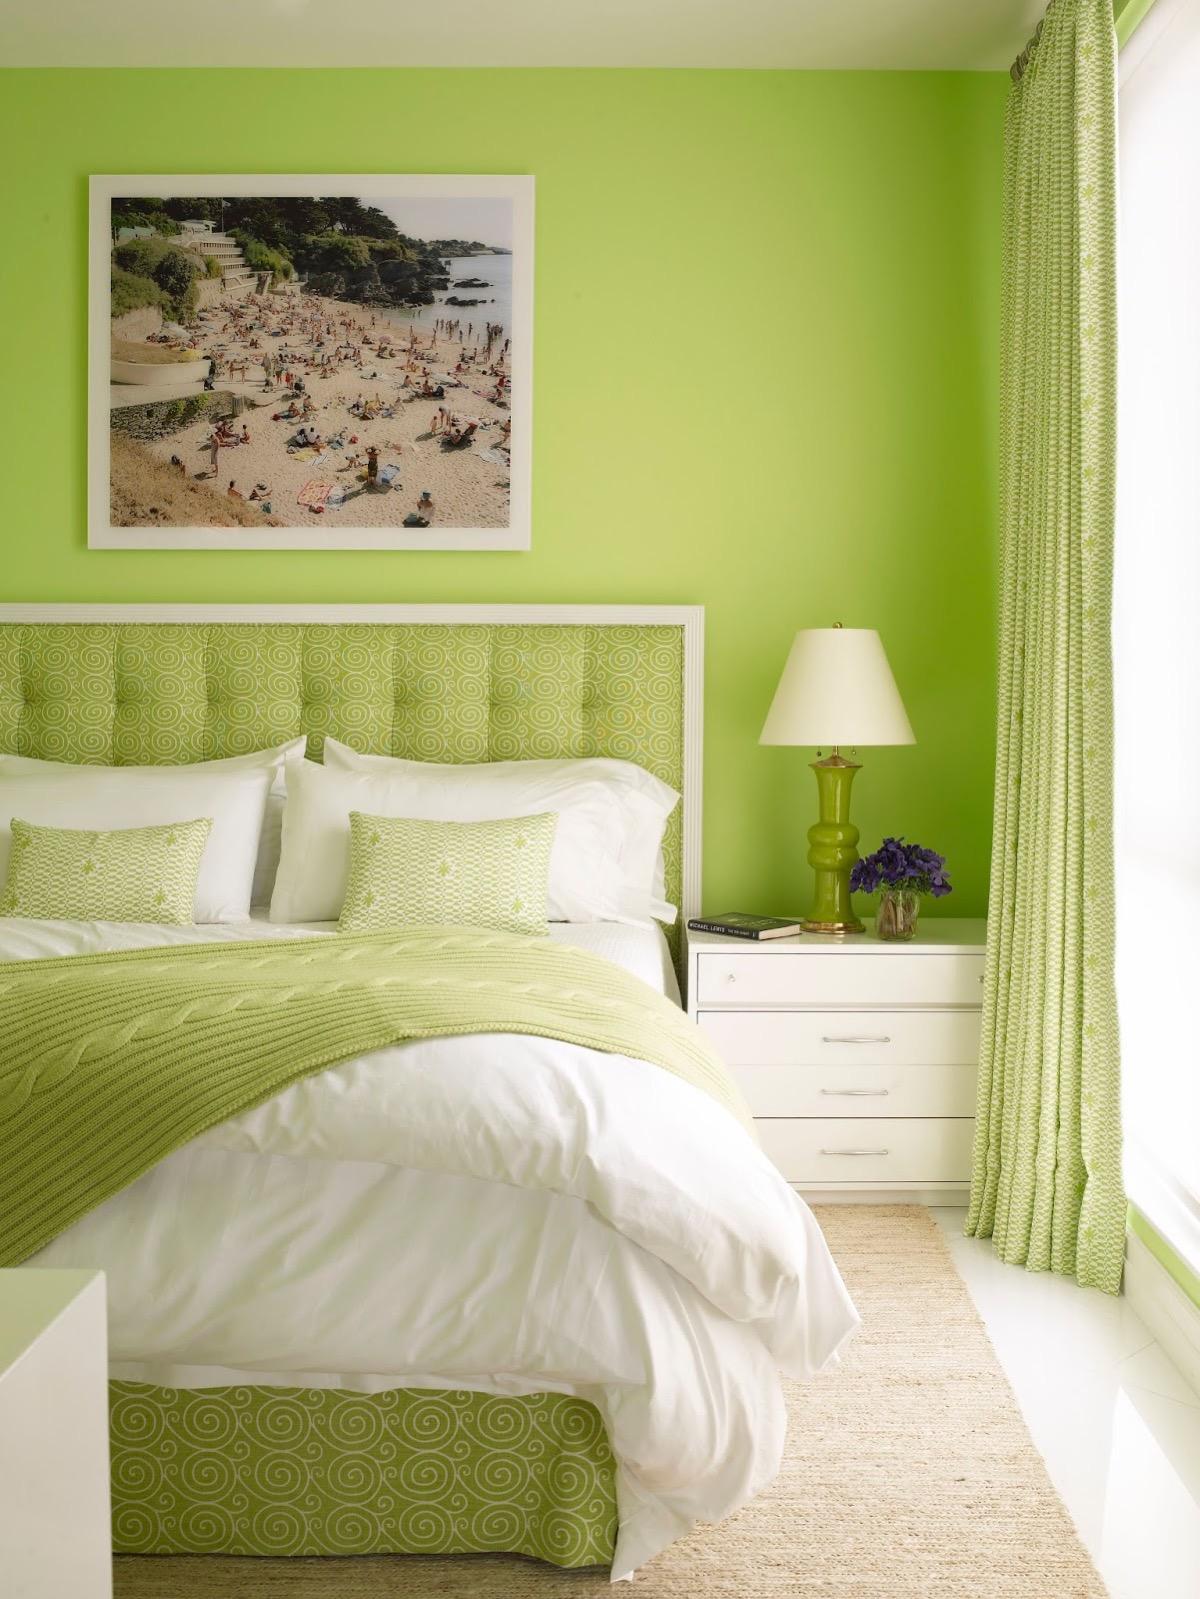 Lime green paint in teen bedroom